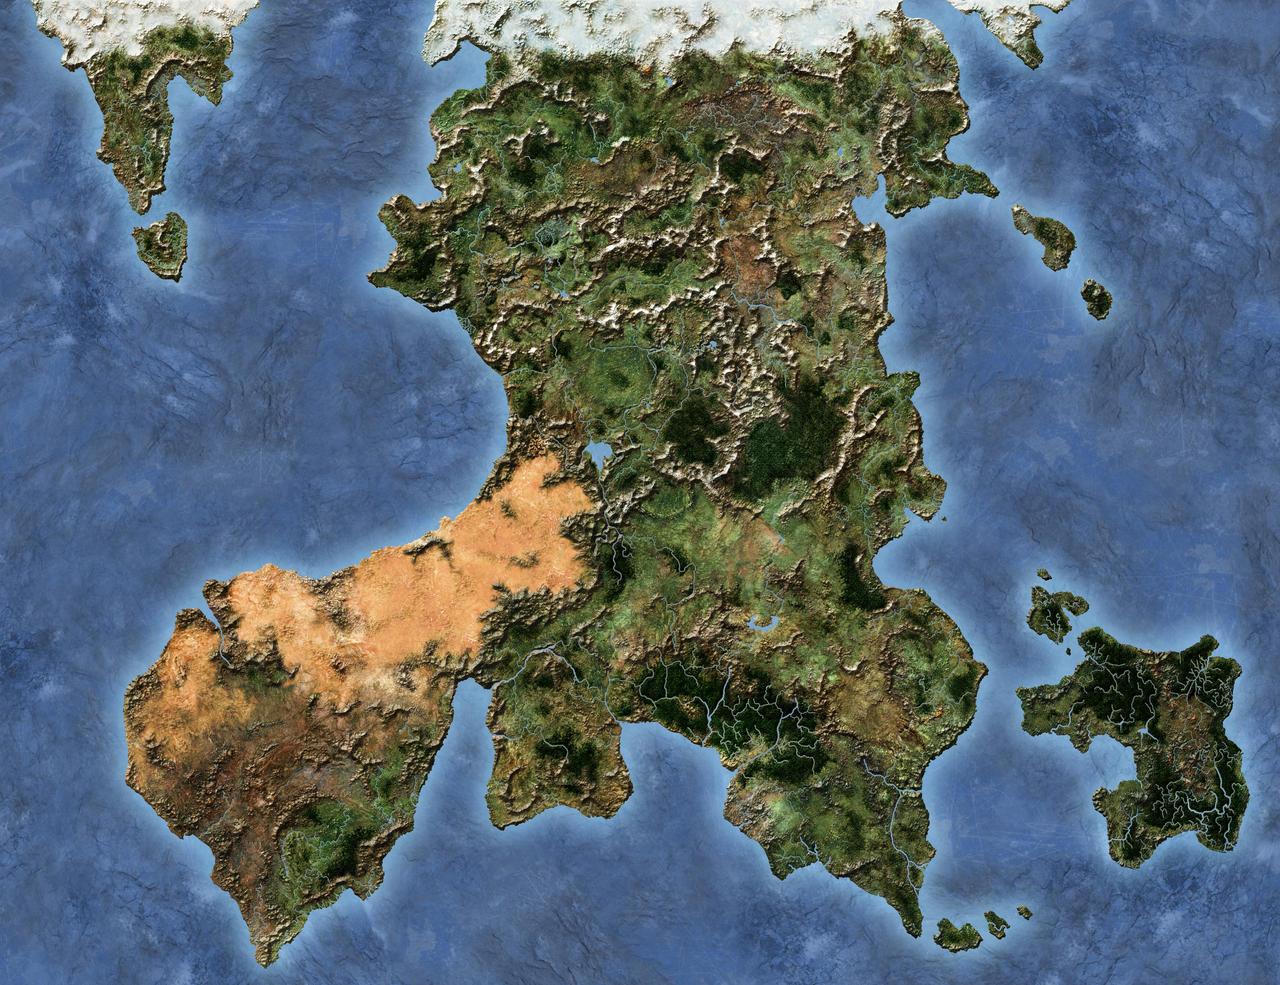 Satellite Map By LordFelwynn On DeviantArt - Digital satellite map